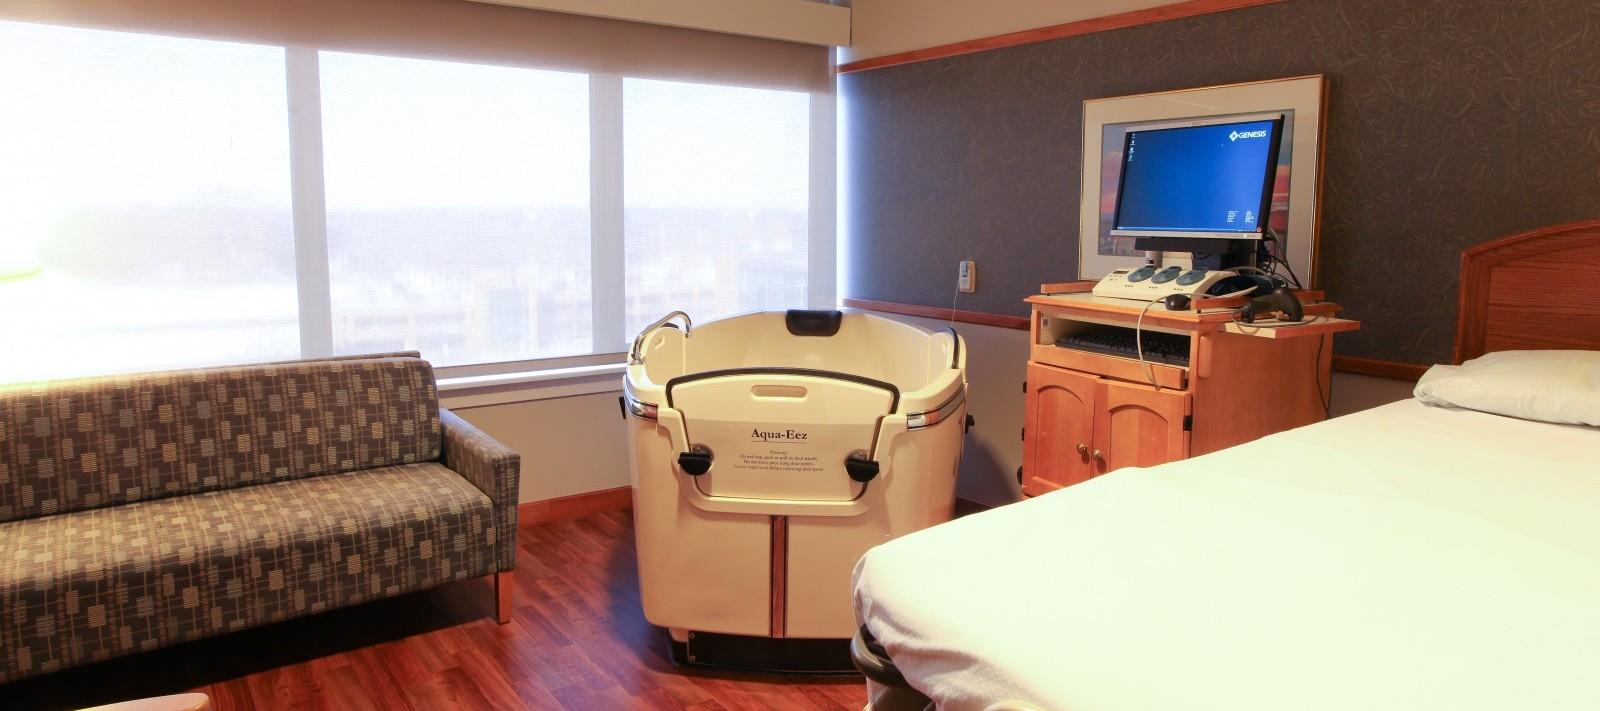 Genesis Birth Center water bath unit